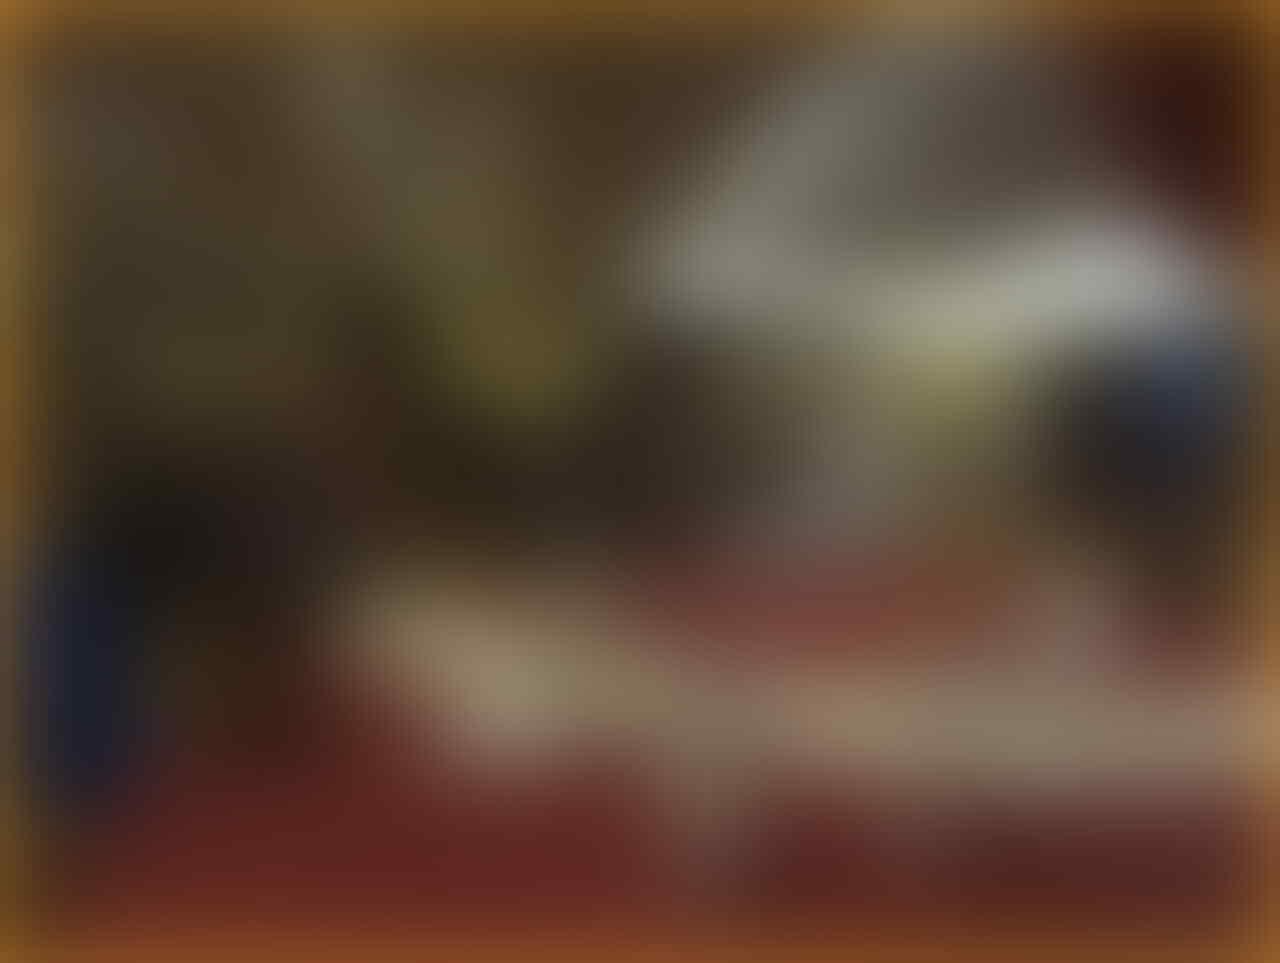 [FR] Kaskus Regional Visit Malang with XL Bikin Kaskuser #JadiBisa Silaturahmi